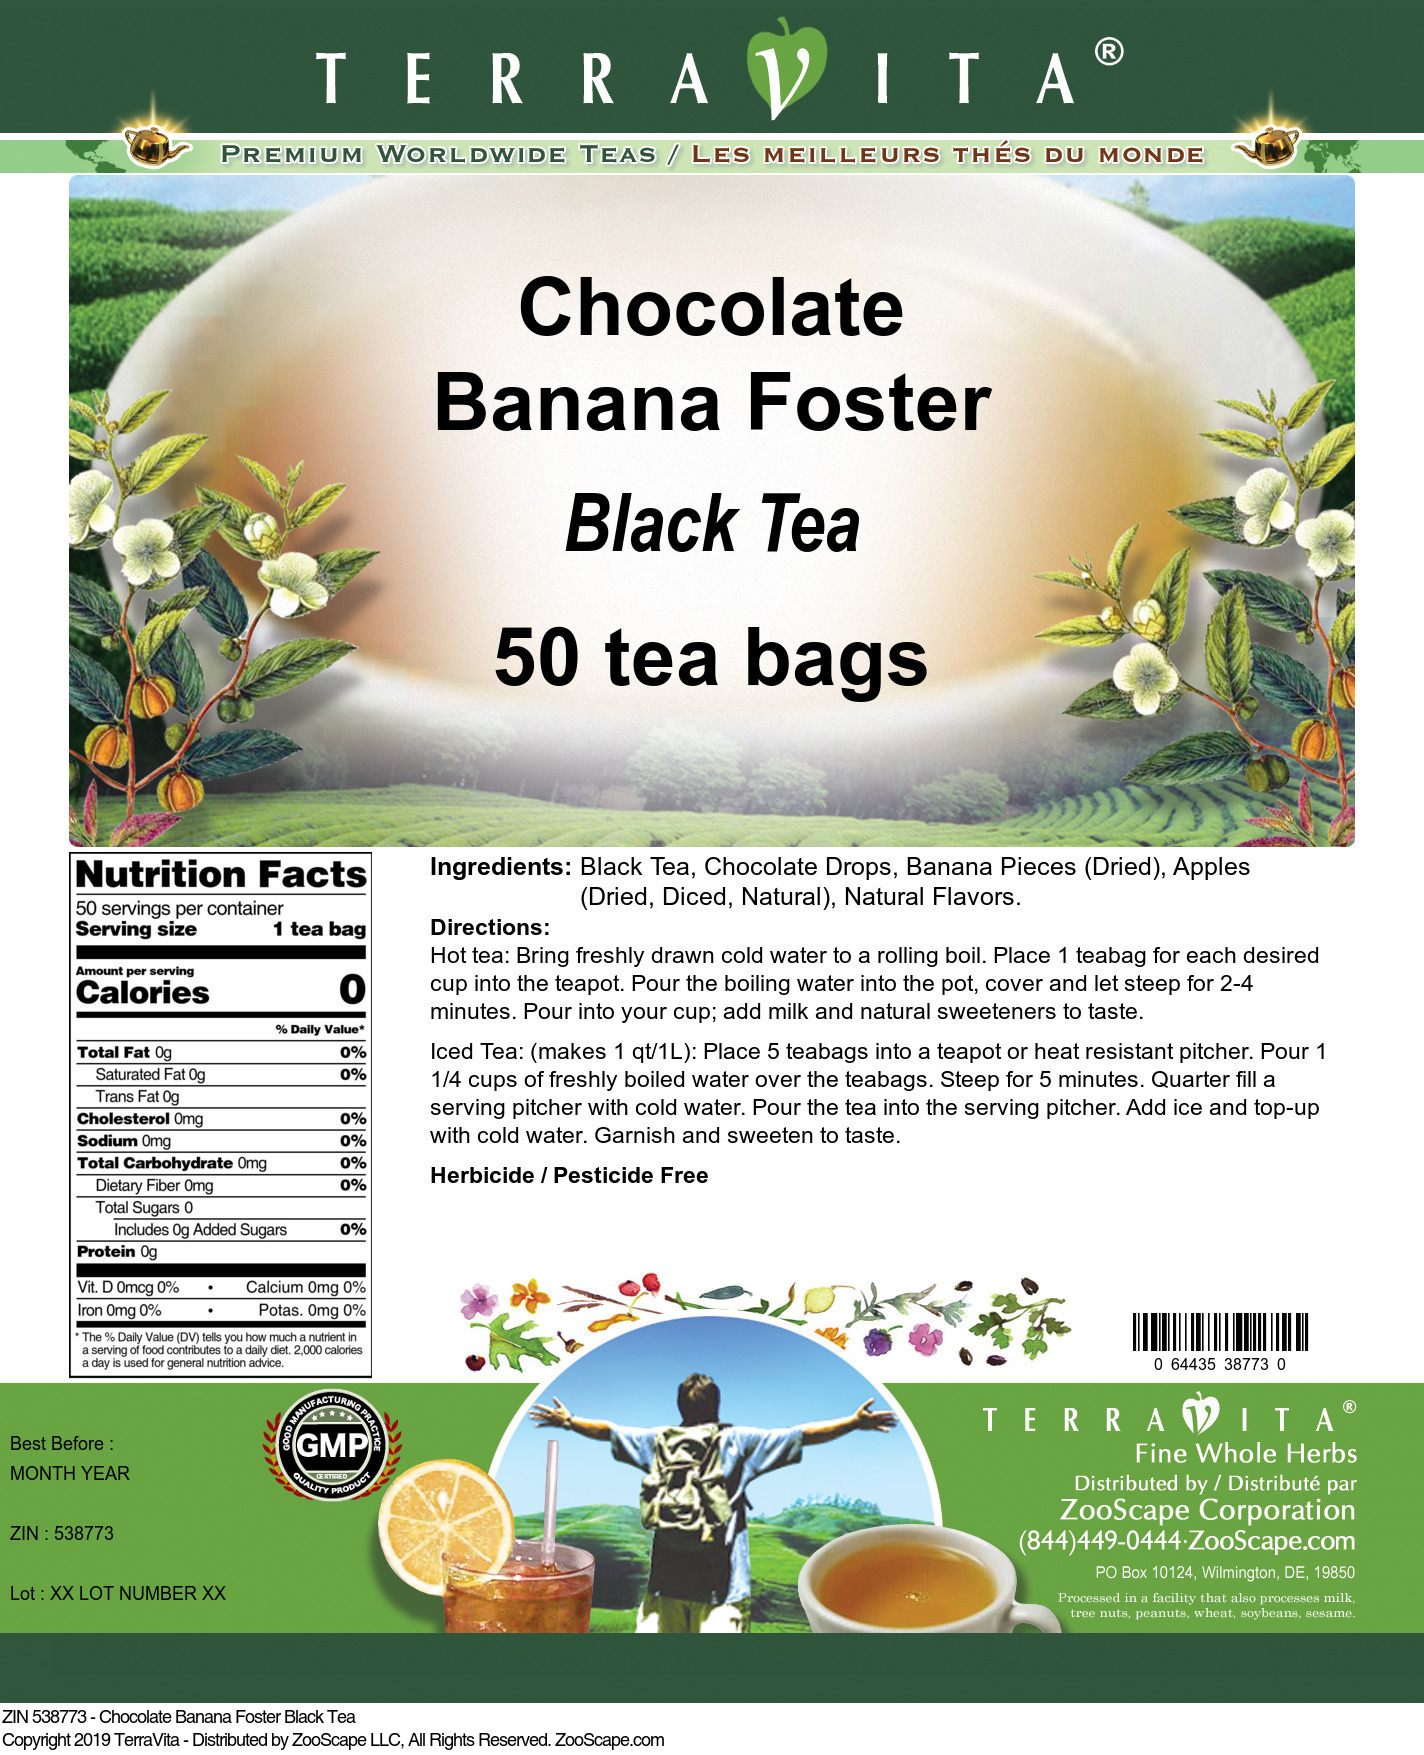 Chocolate Banana Foster Black Tea